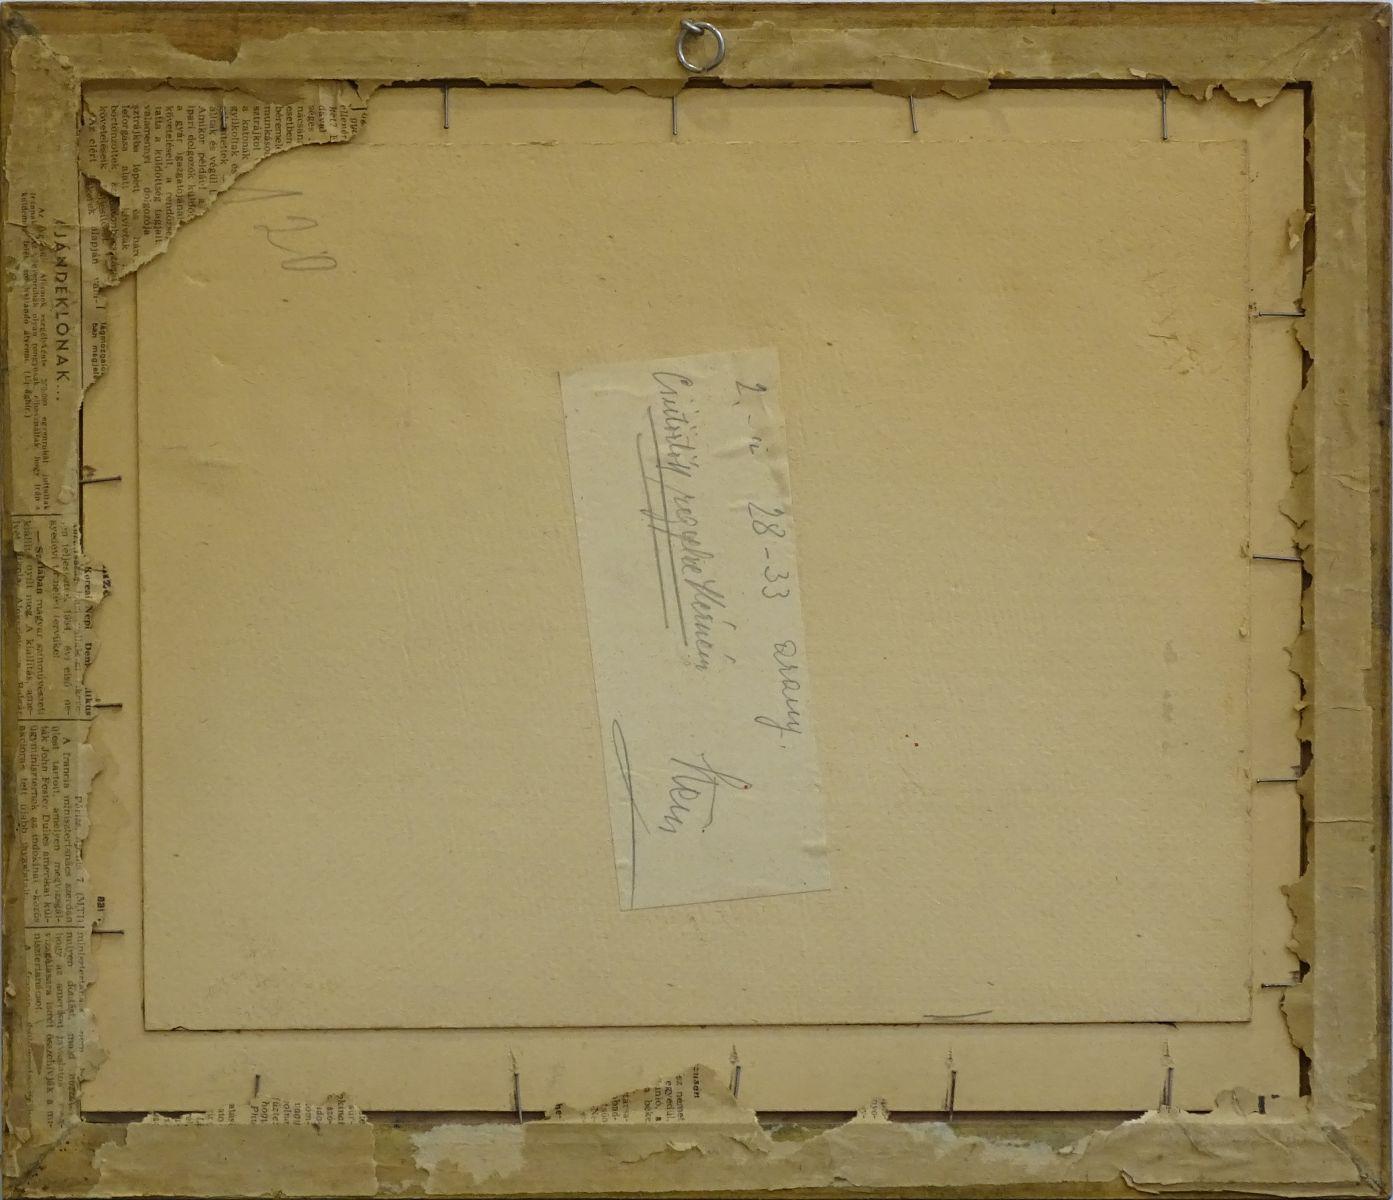 DSC06781.JPG (1393×1200)